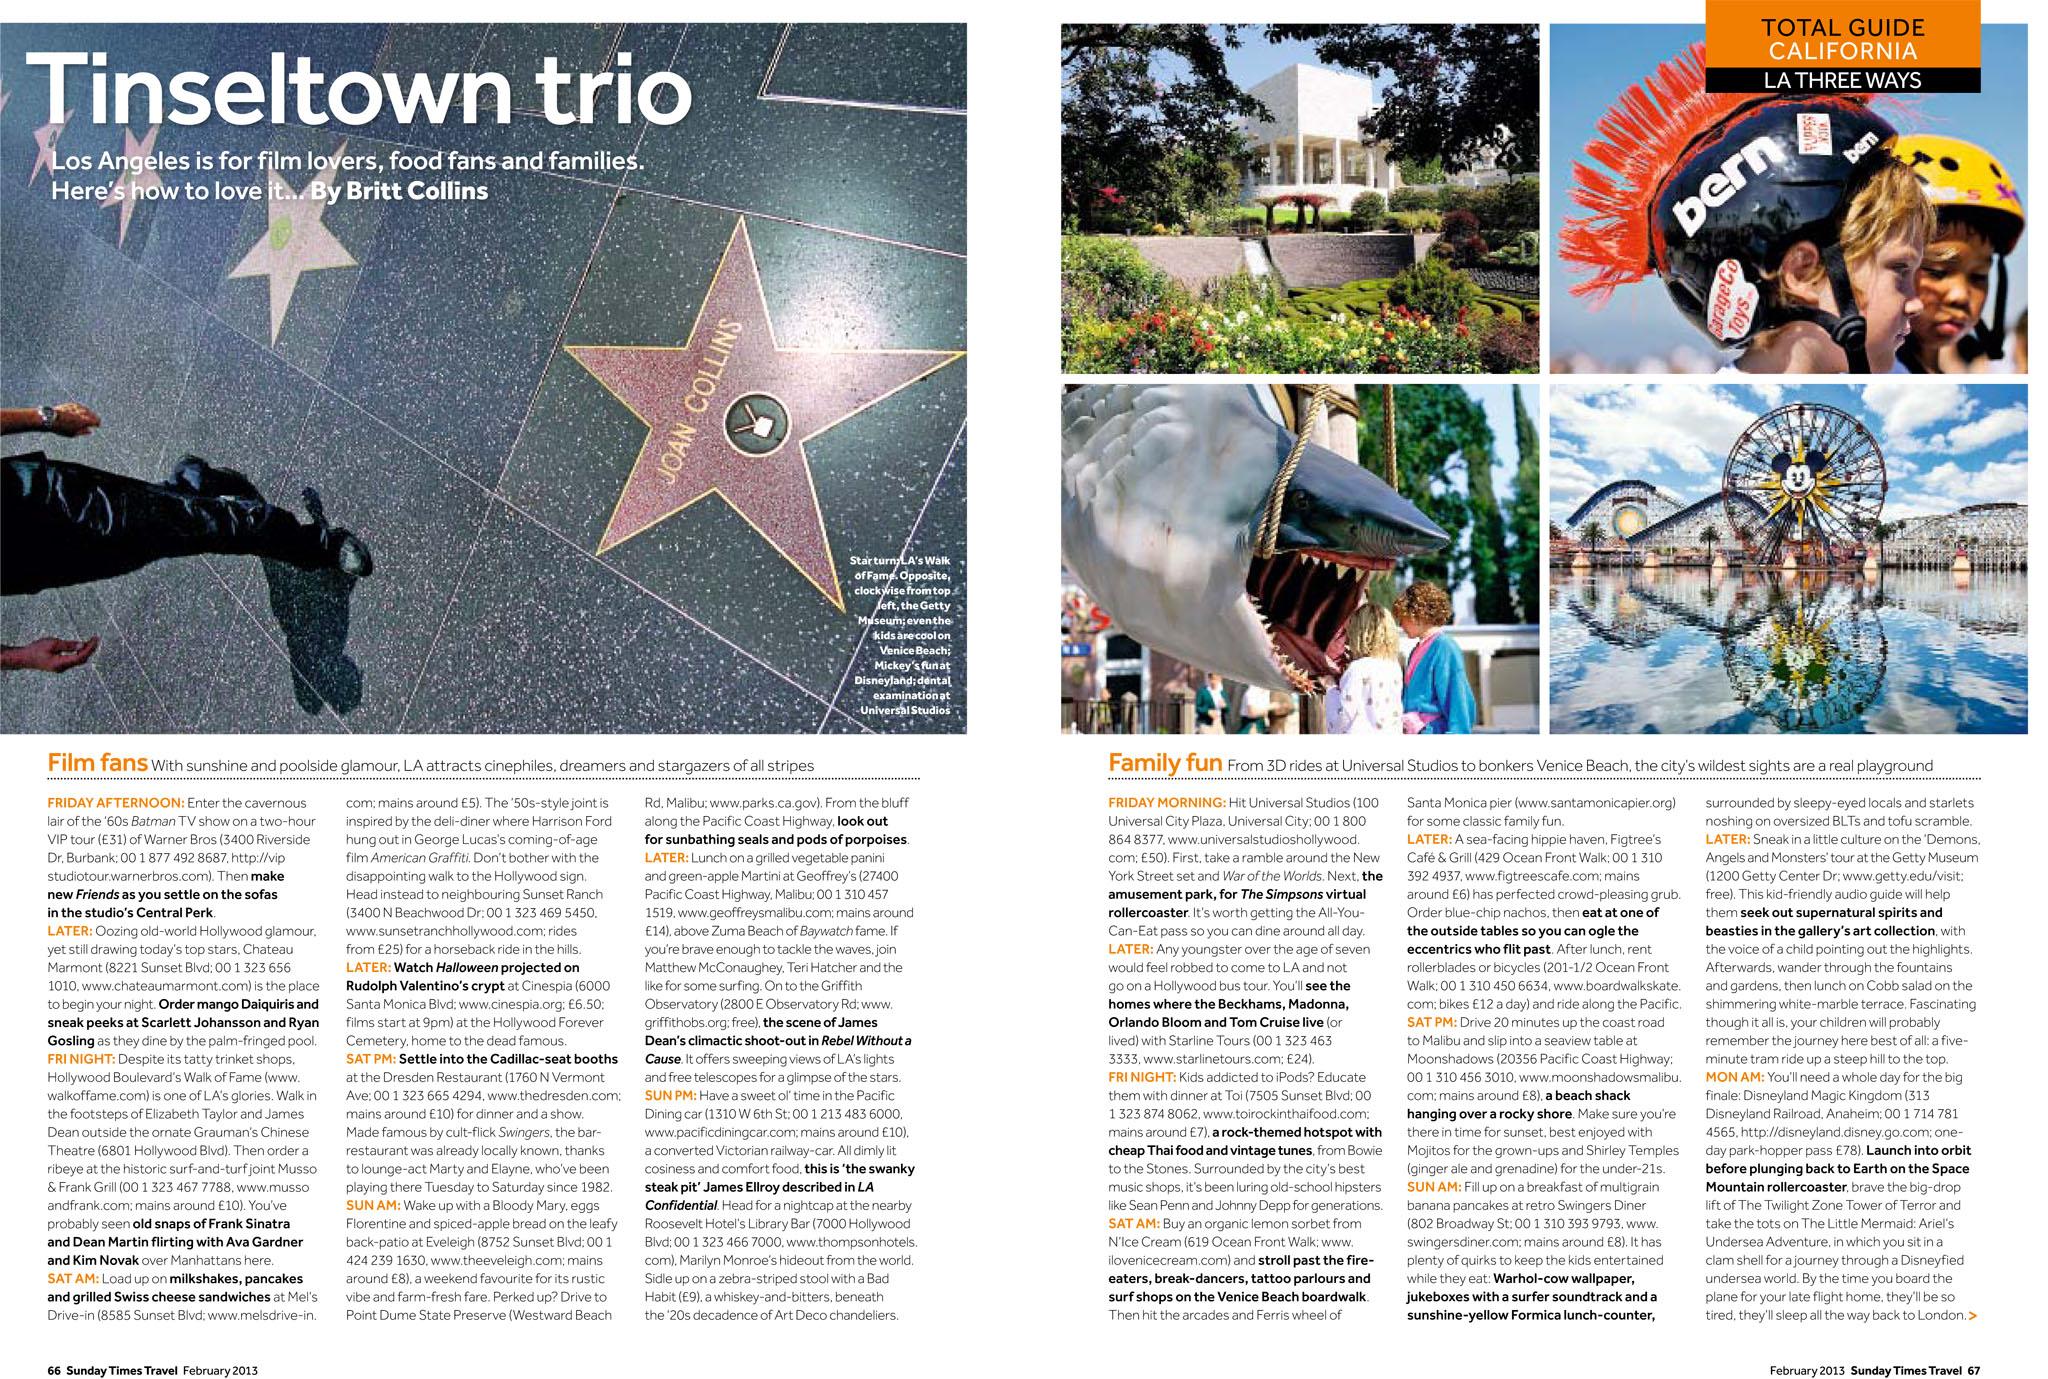 California Guide-1